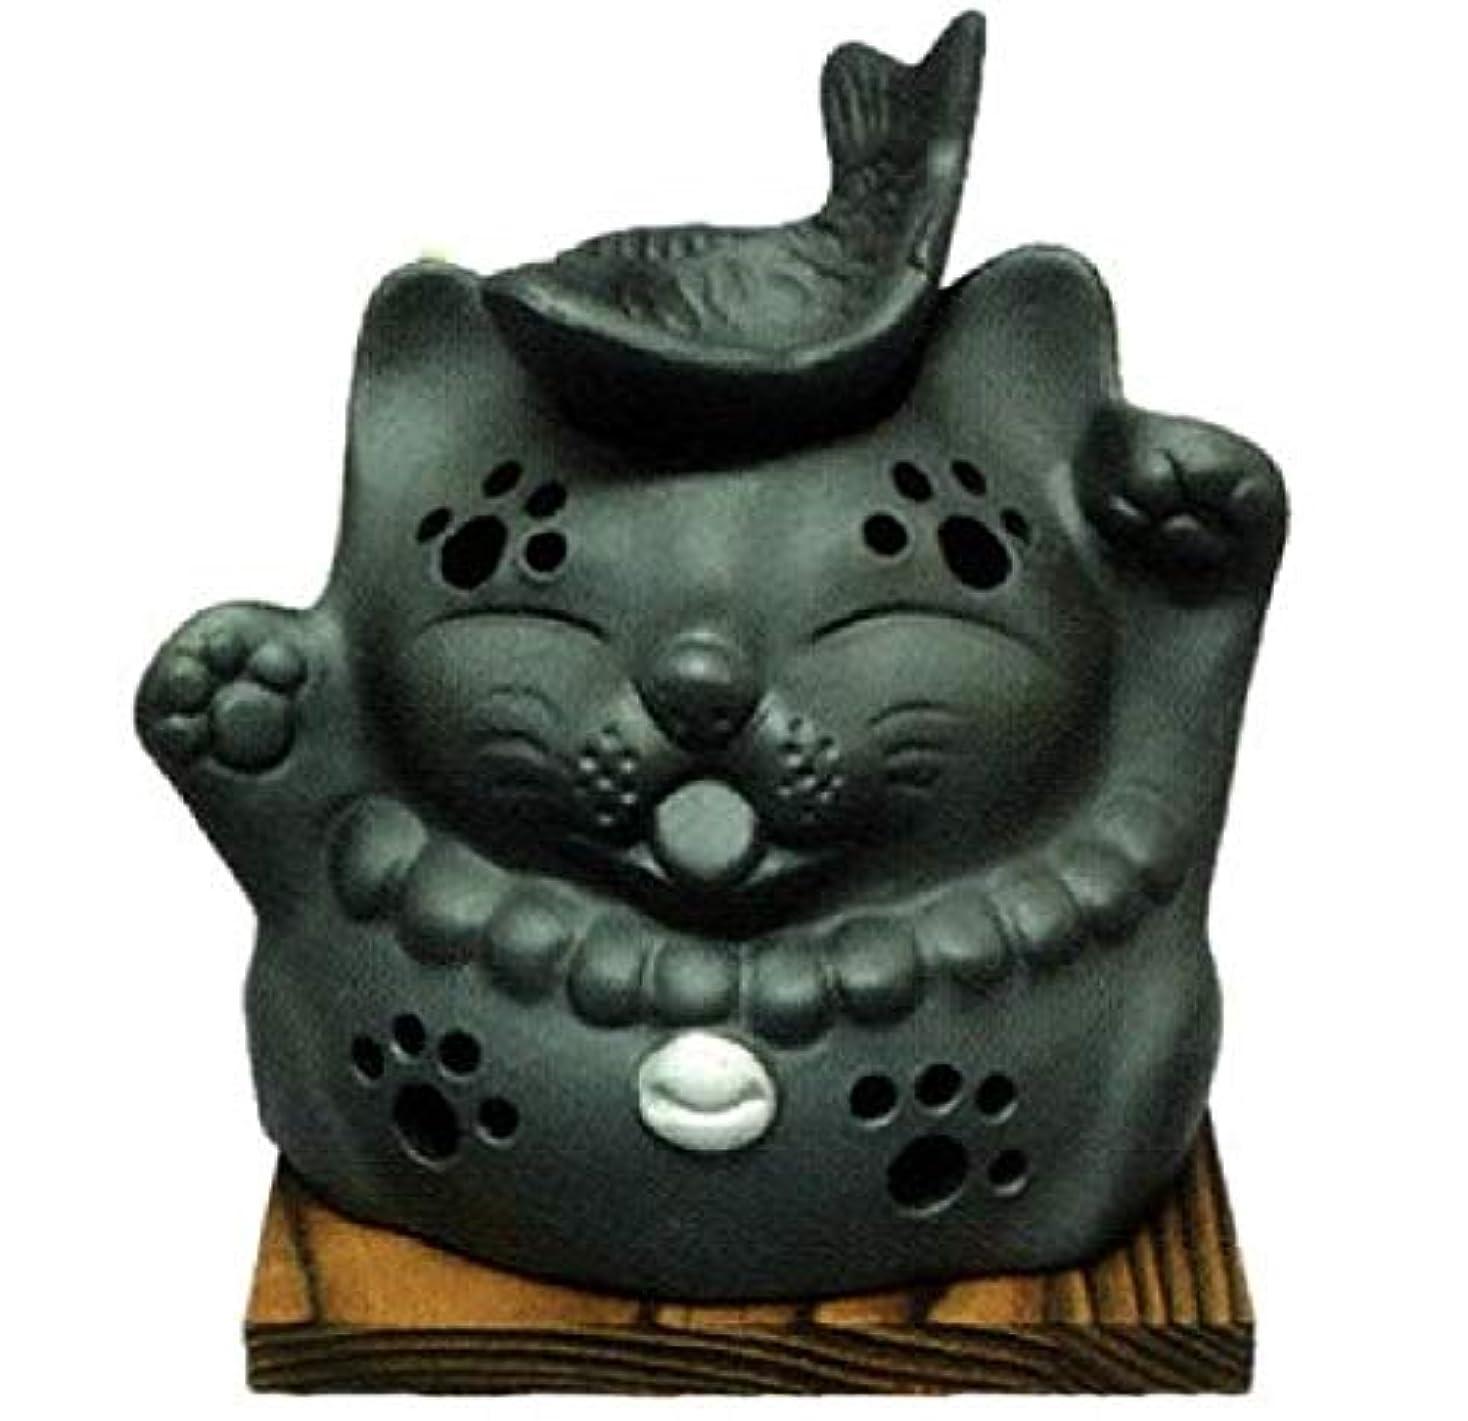 配偶者小学生維持する常滑焼?山房窯 カ39-12 茶香炉 猫と魚 杉板付 径12.5×12cm